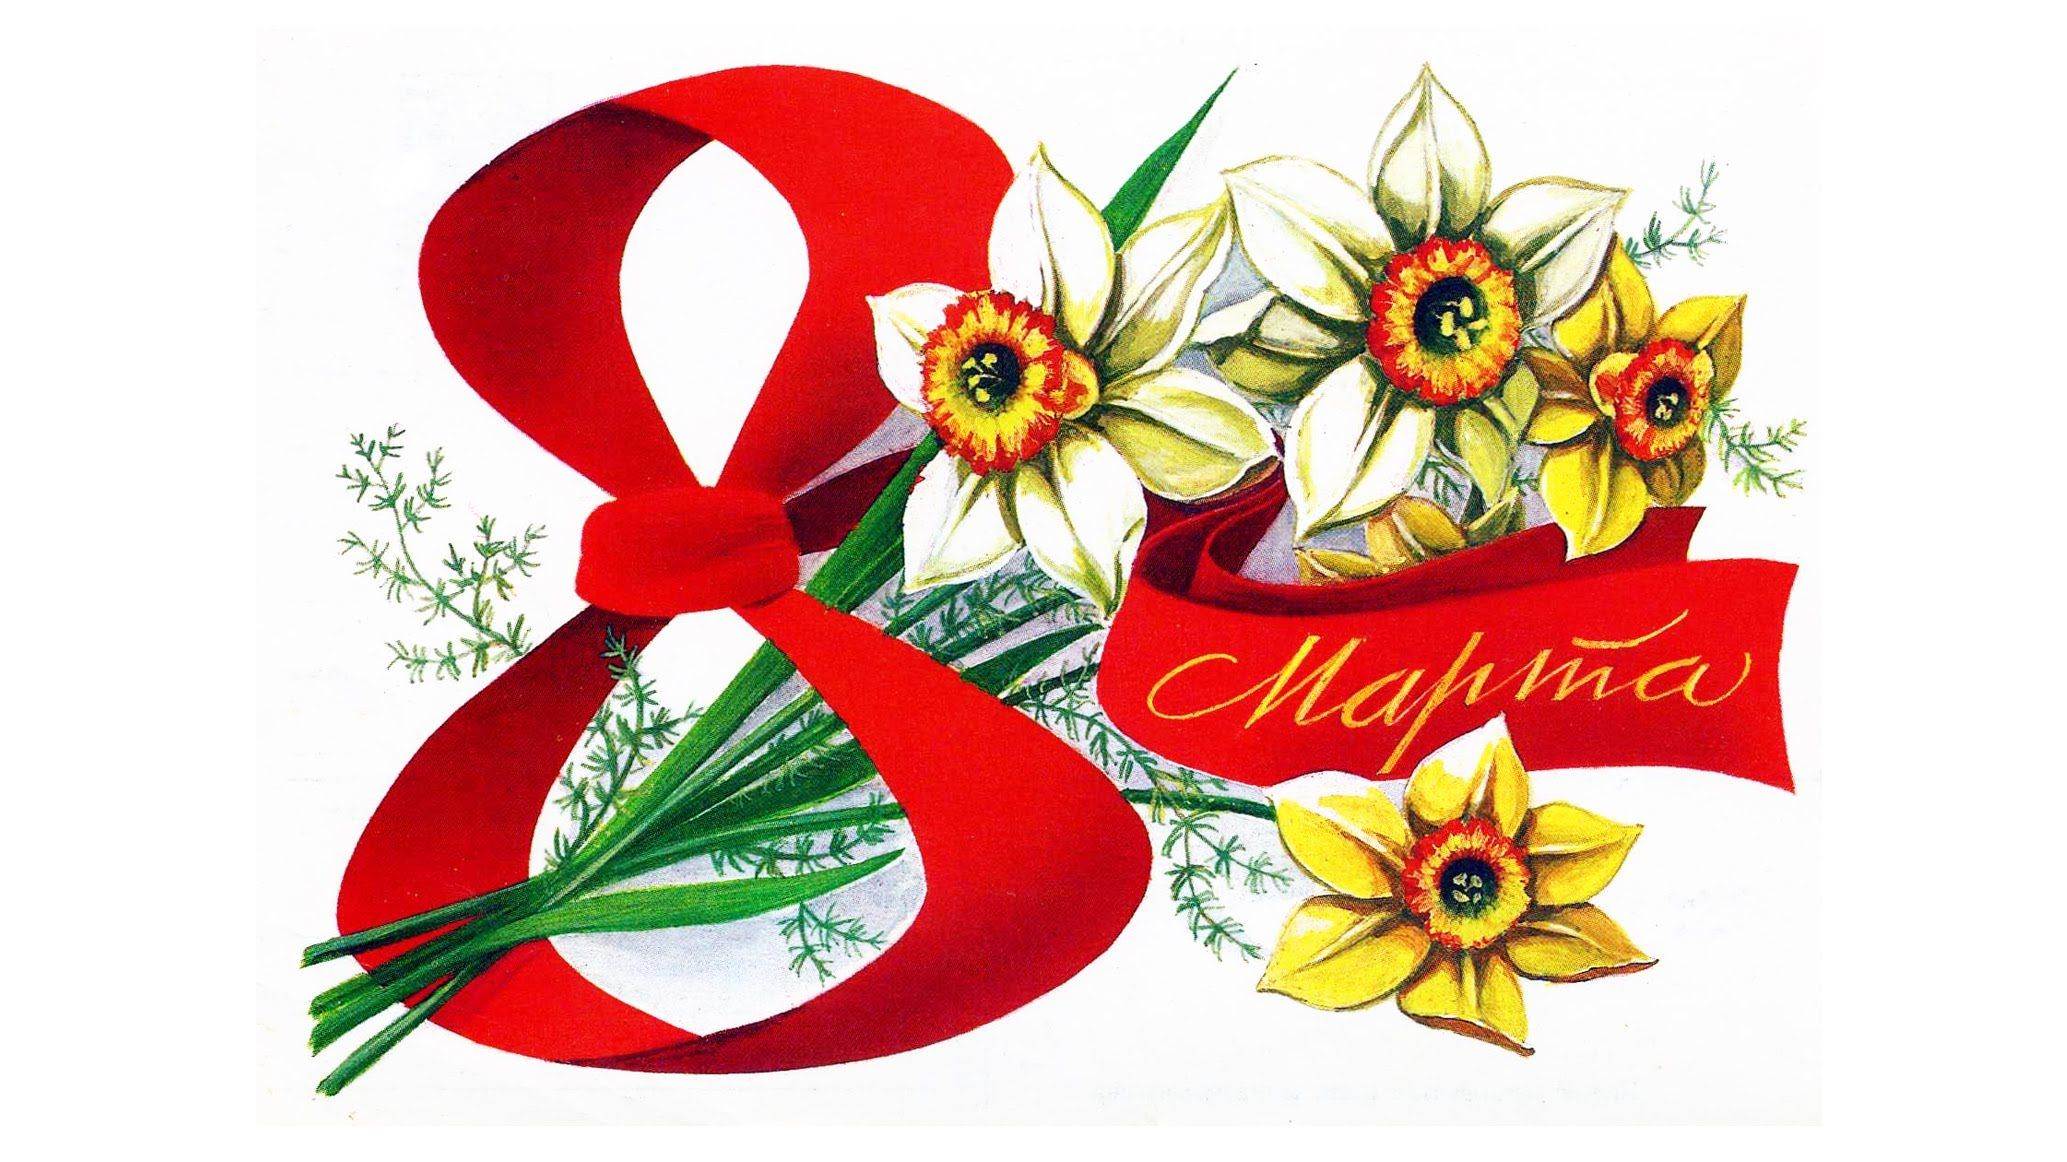 Праздничная открытка на 8 марта